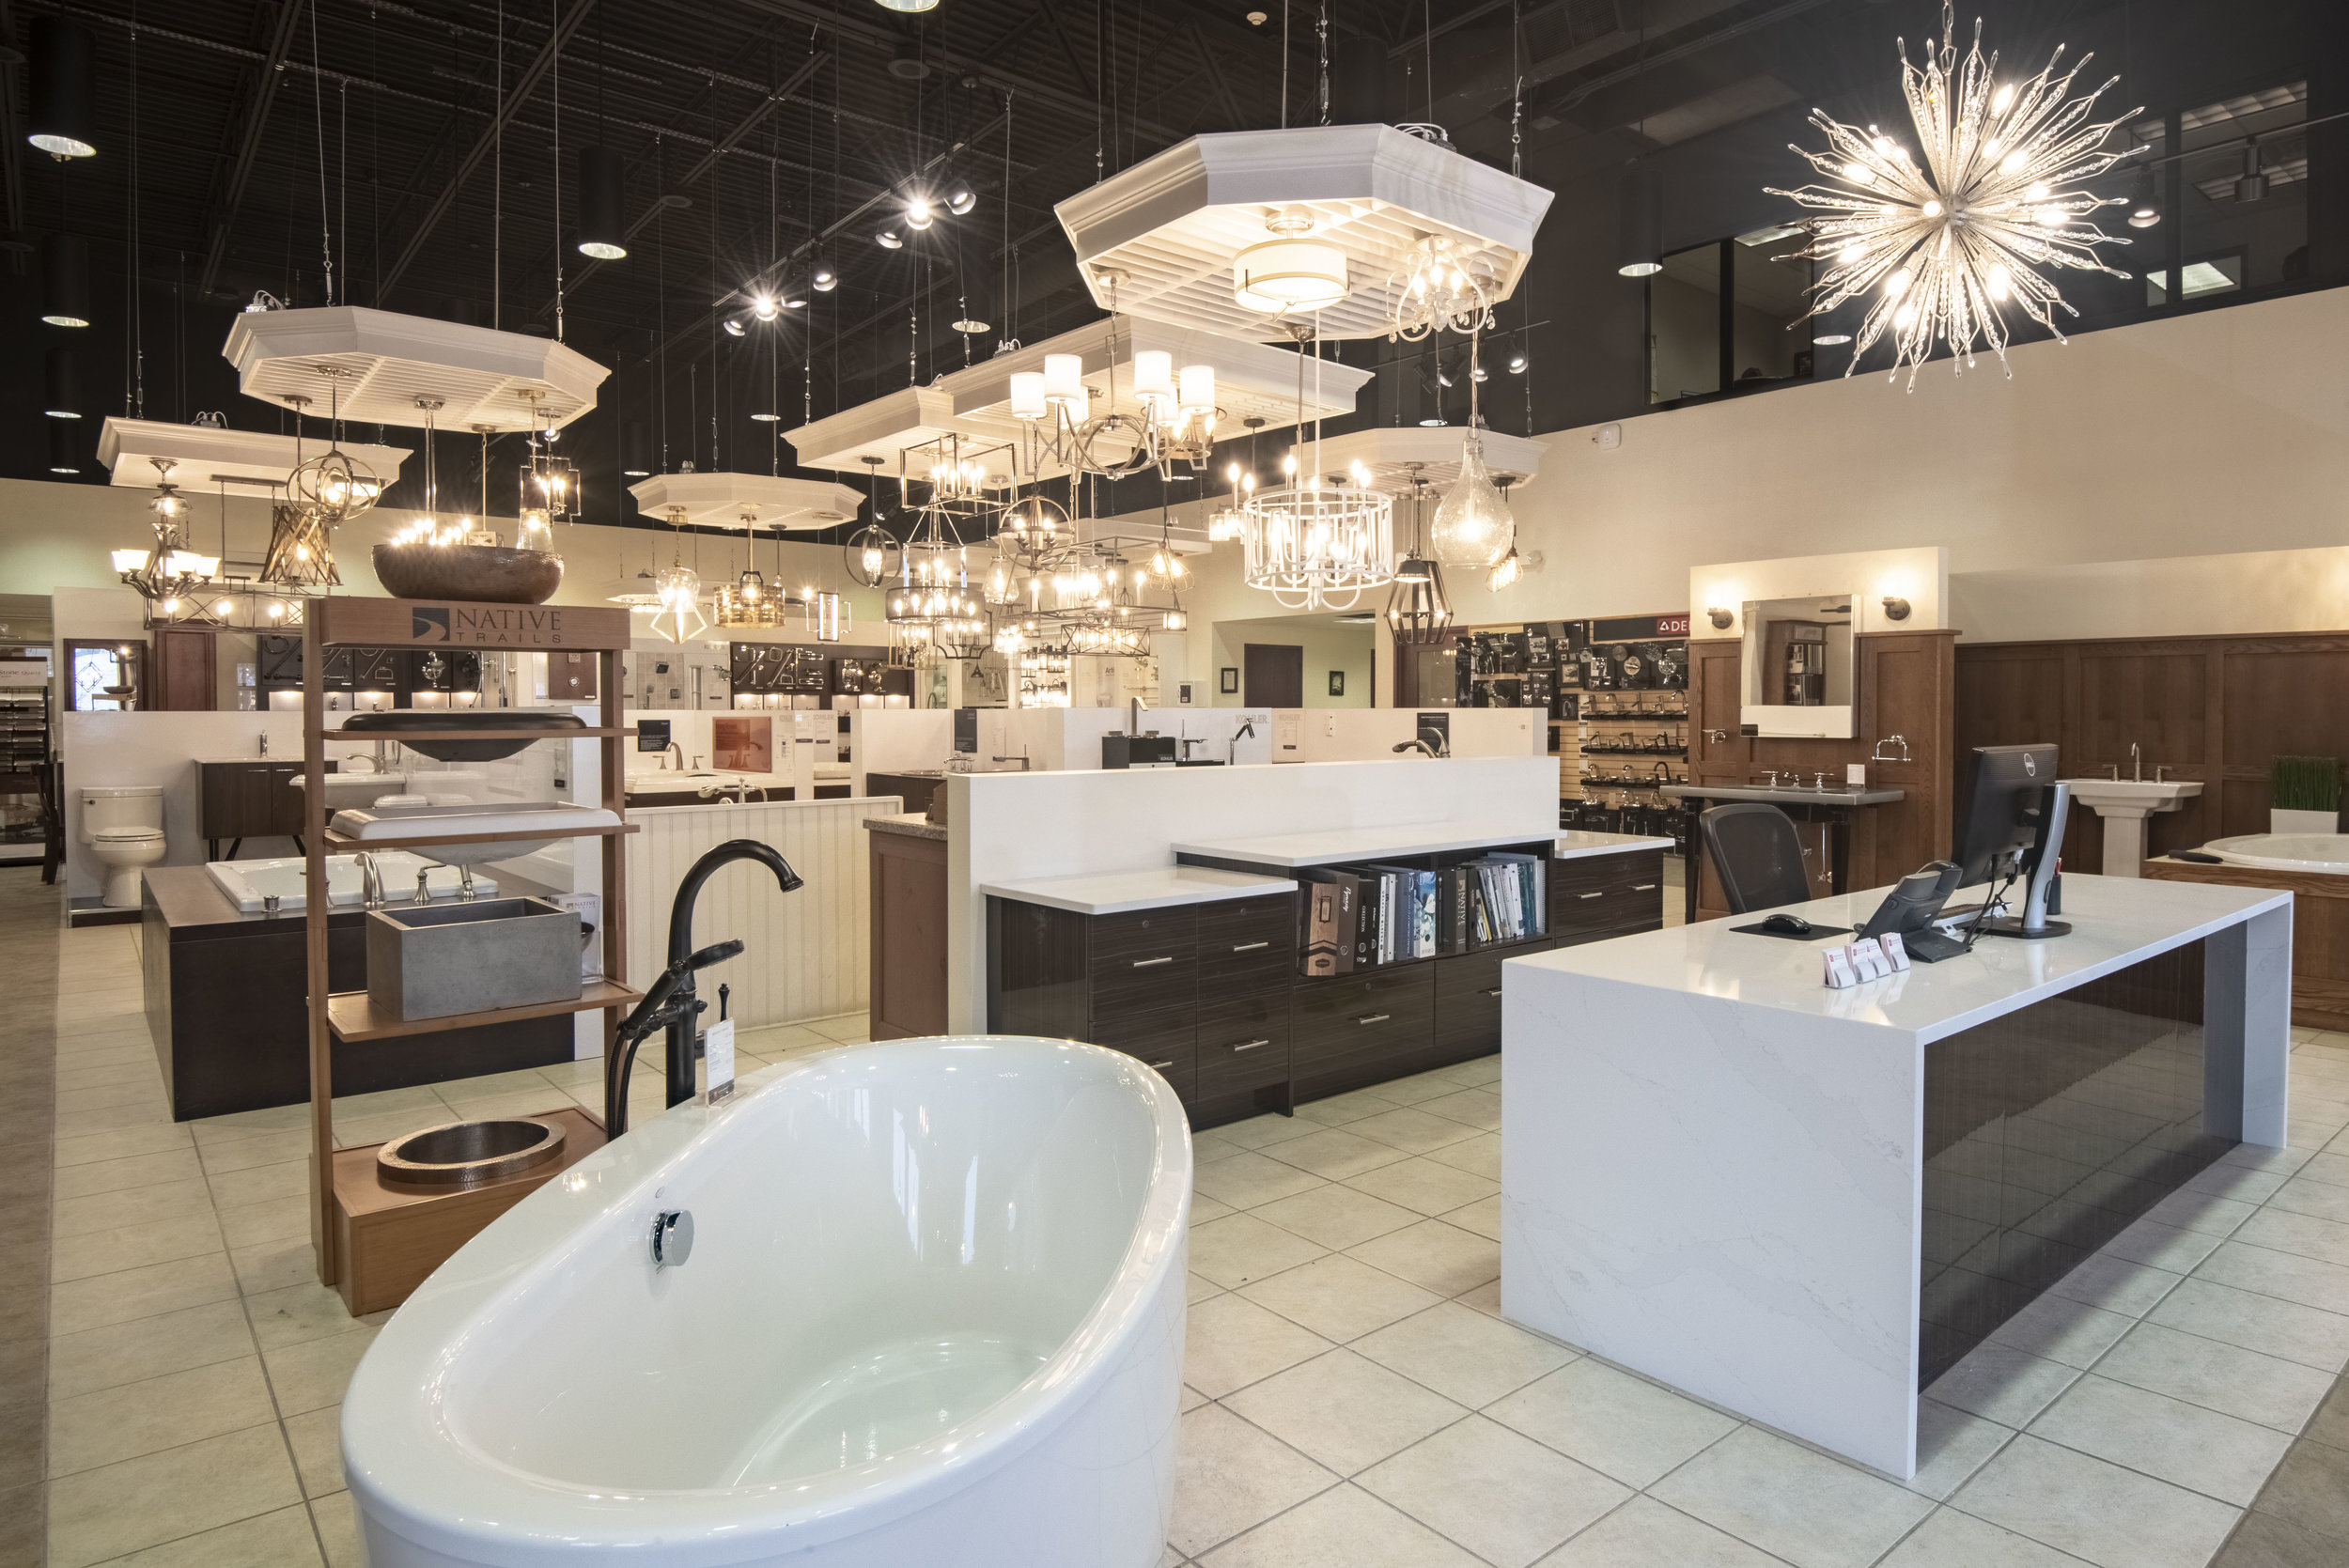 Sheboygan U2014 Gerhardu0027s Kitchen U0026 Bath Store